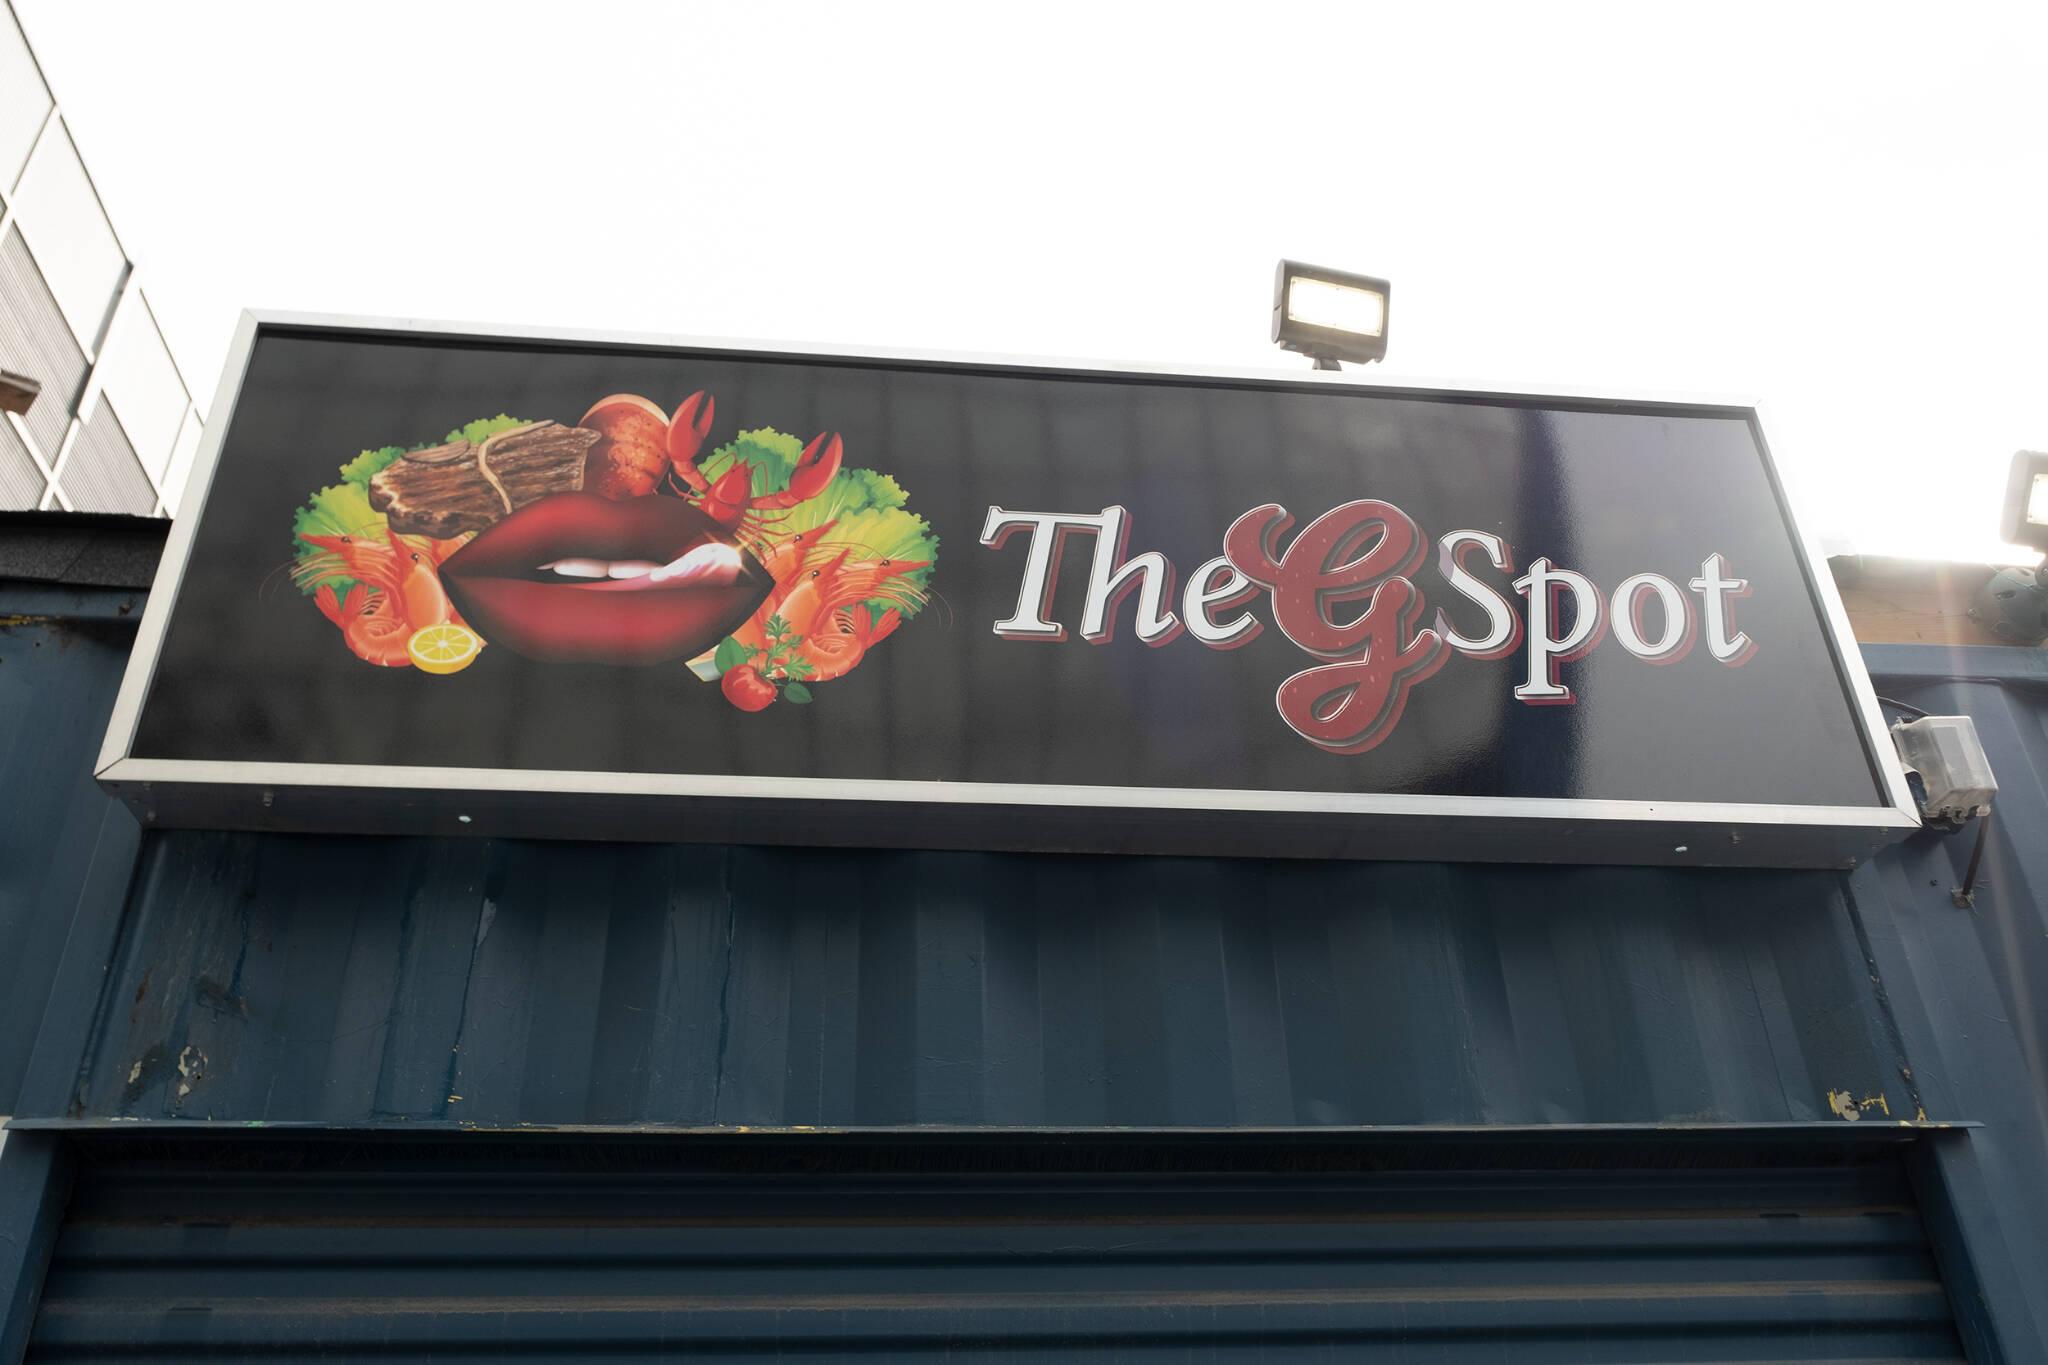 The Gspot Toronto